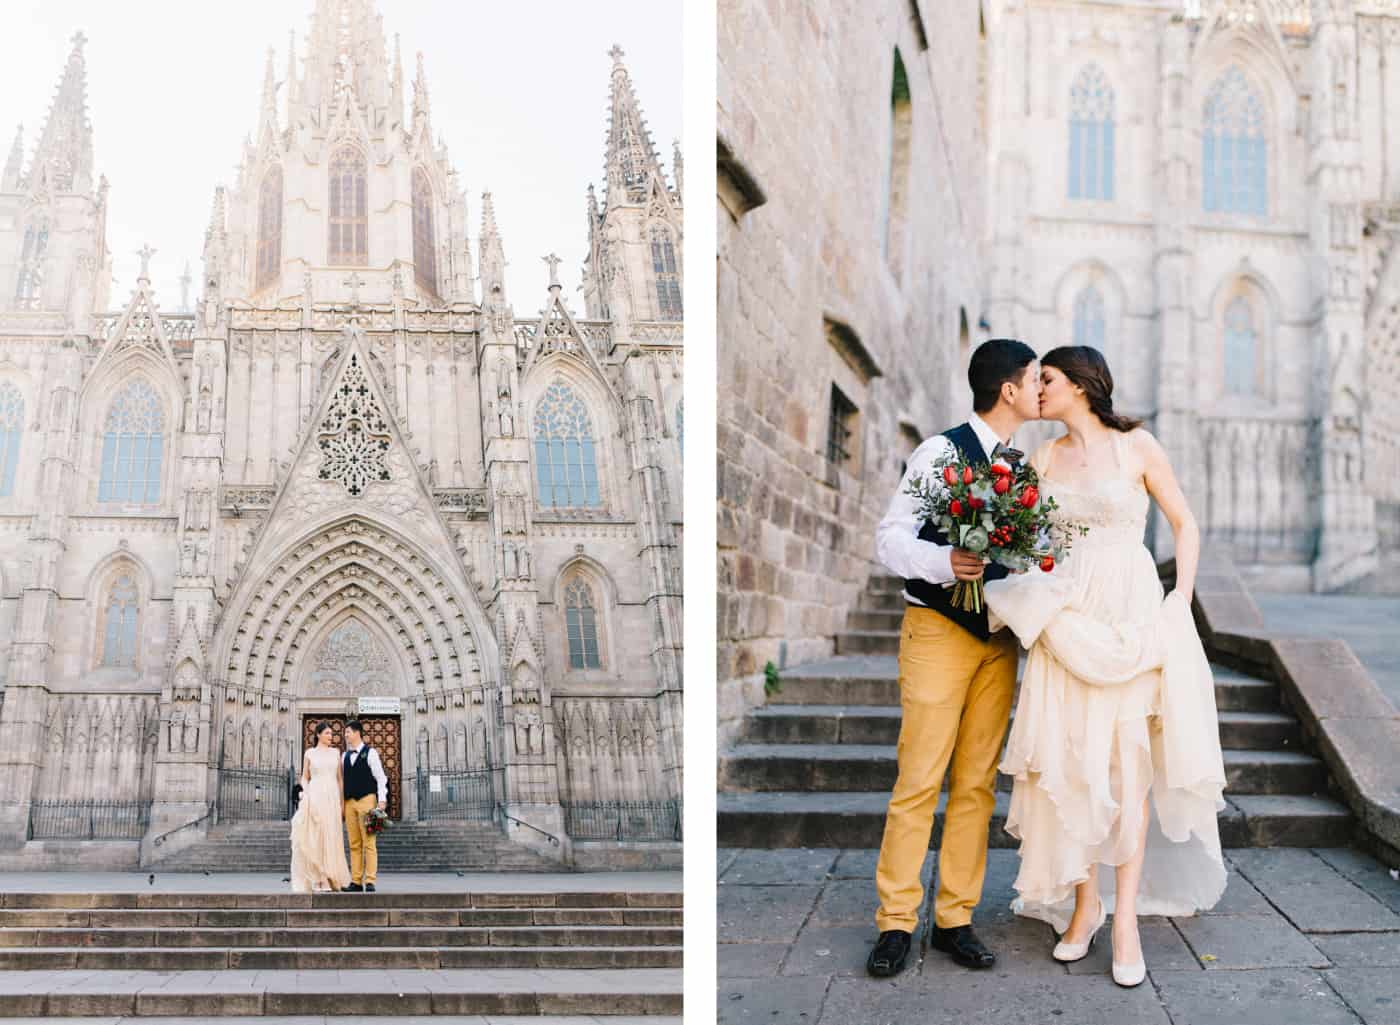 images-destination-weddings-08